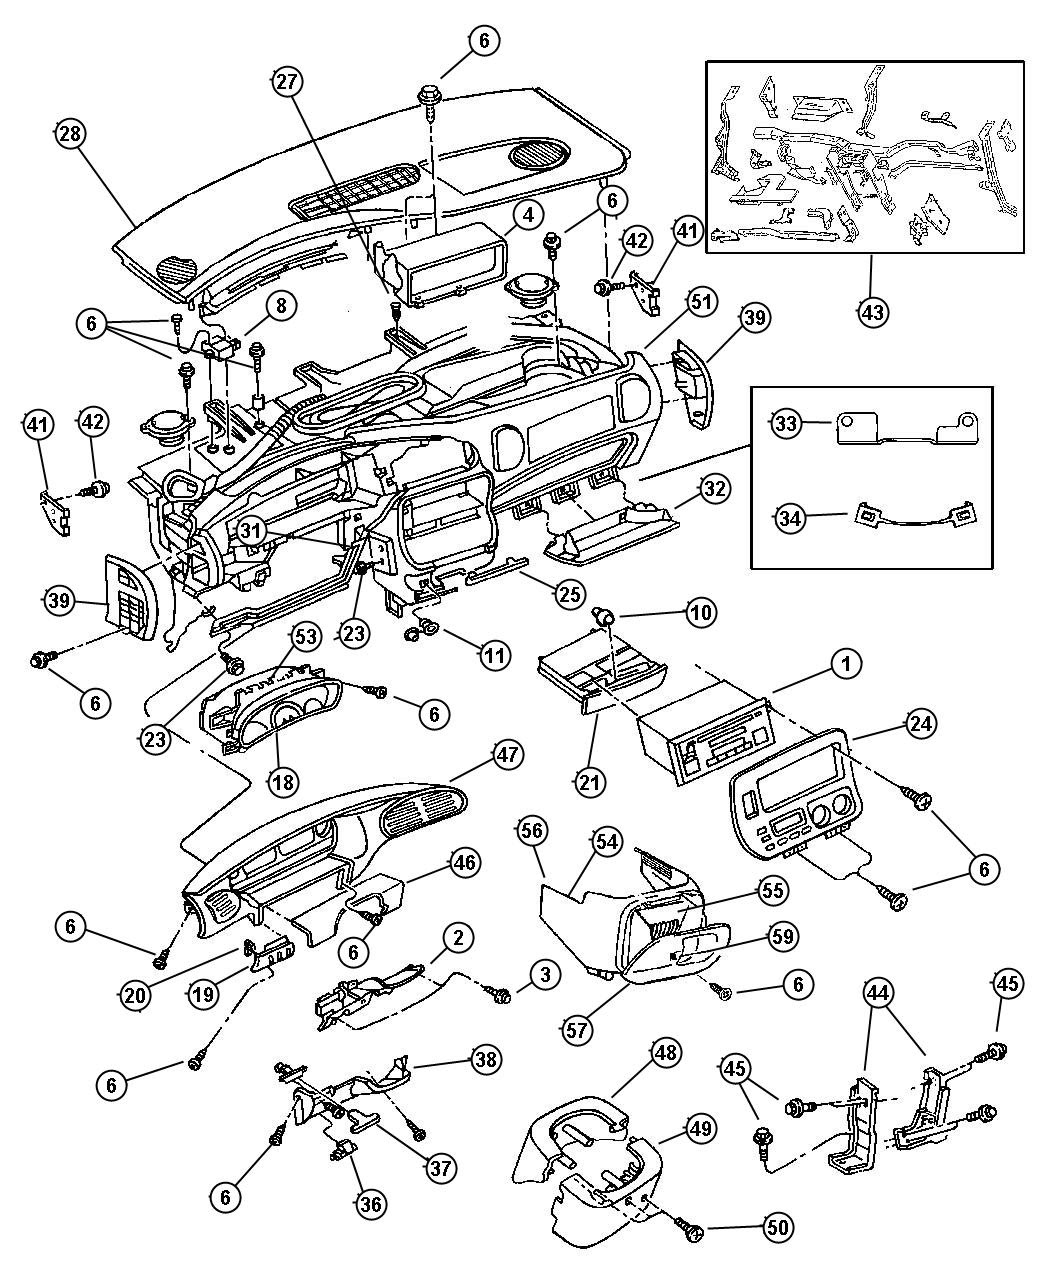 [DIAGRAM] Chrysler Minivan Town Country Engine Diagram